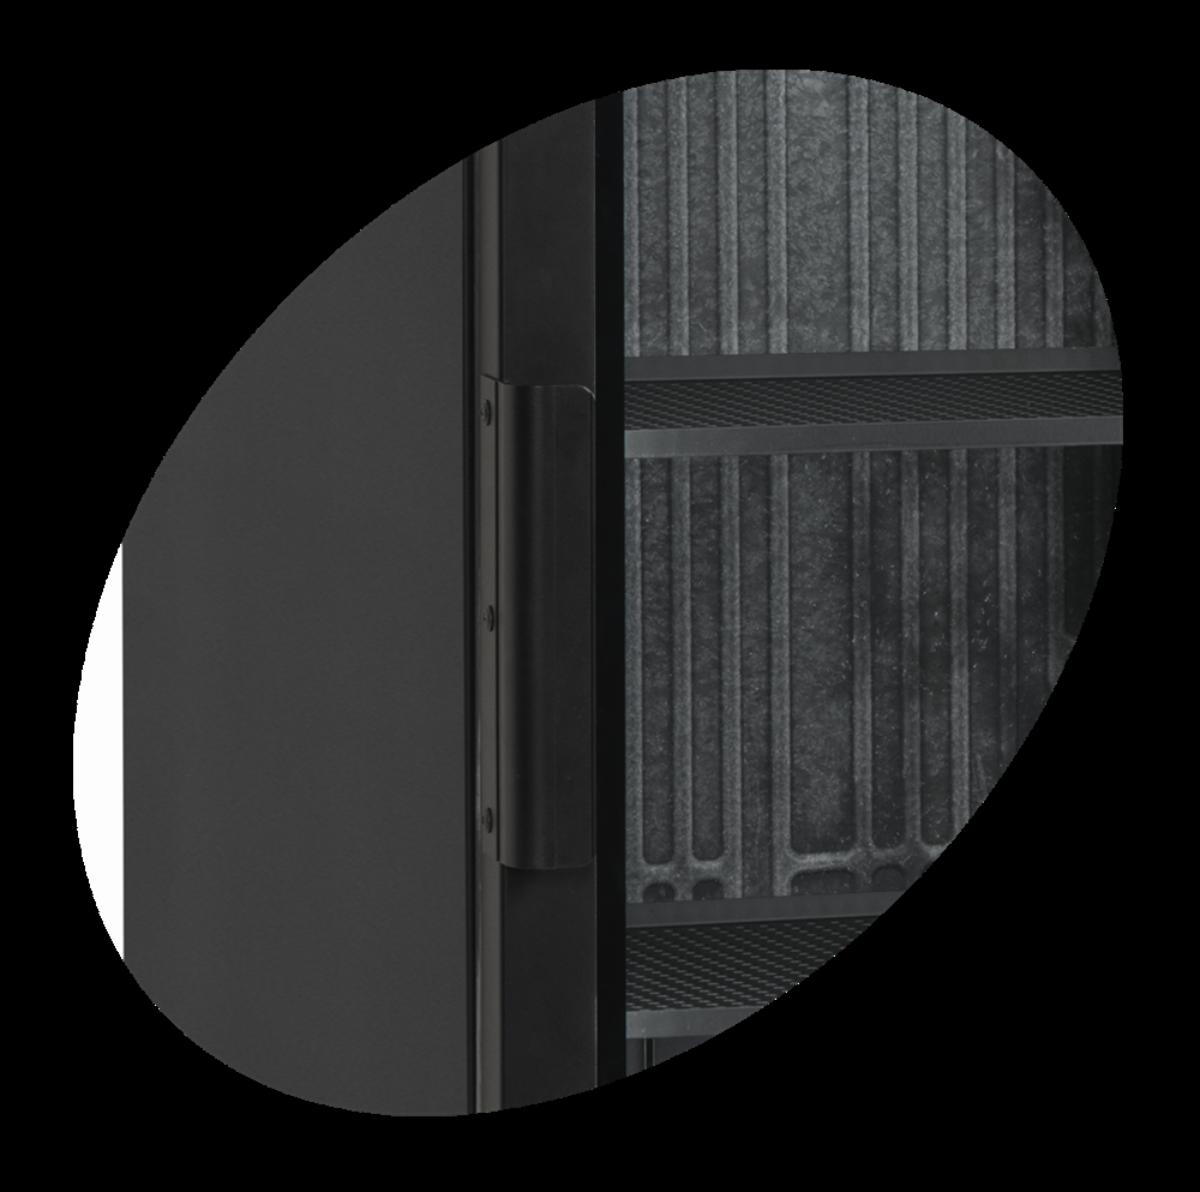 Tefcold display kjøleskap svart 199 cm SCU1425H